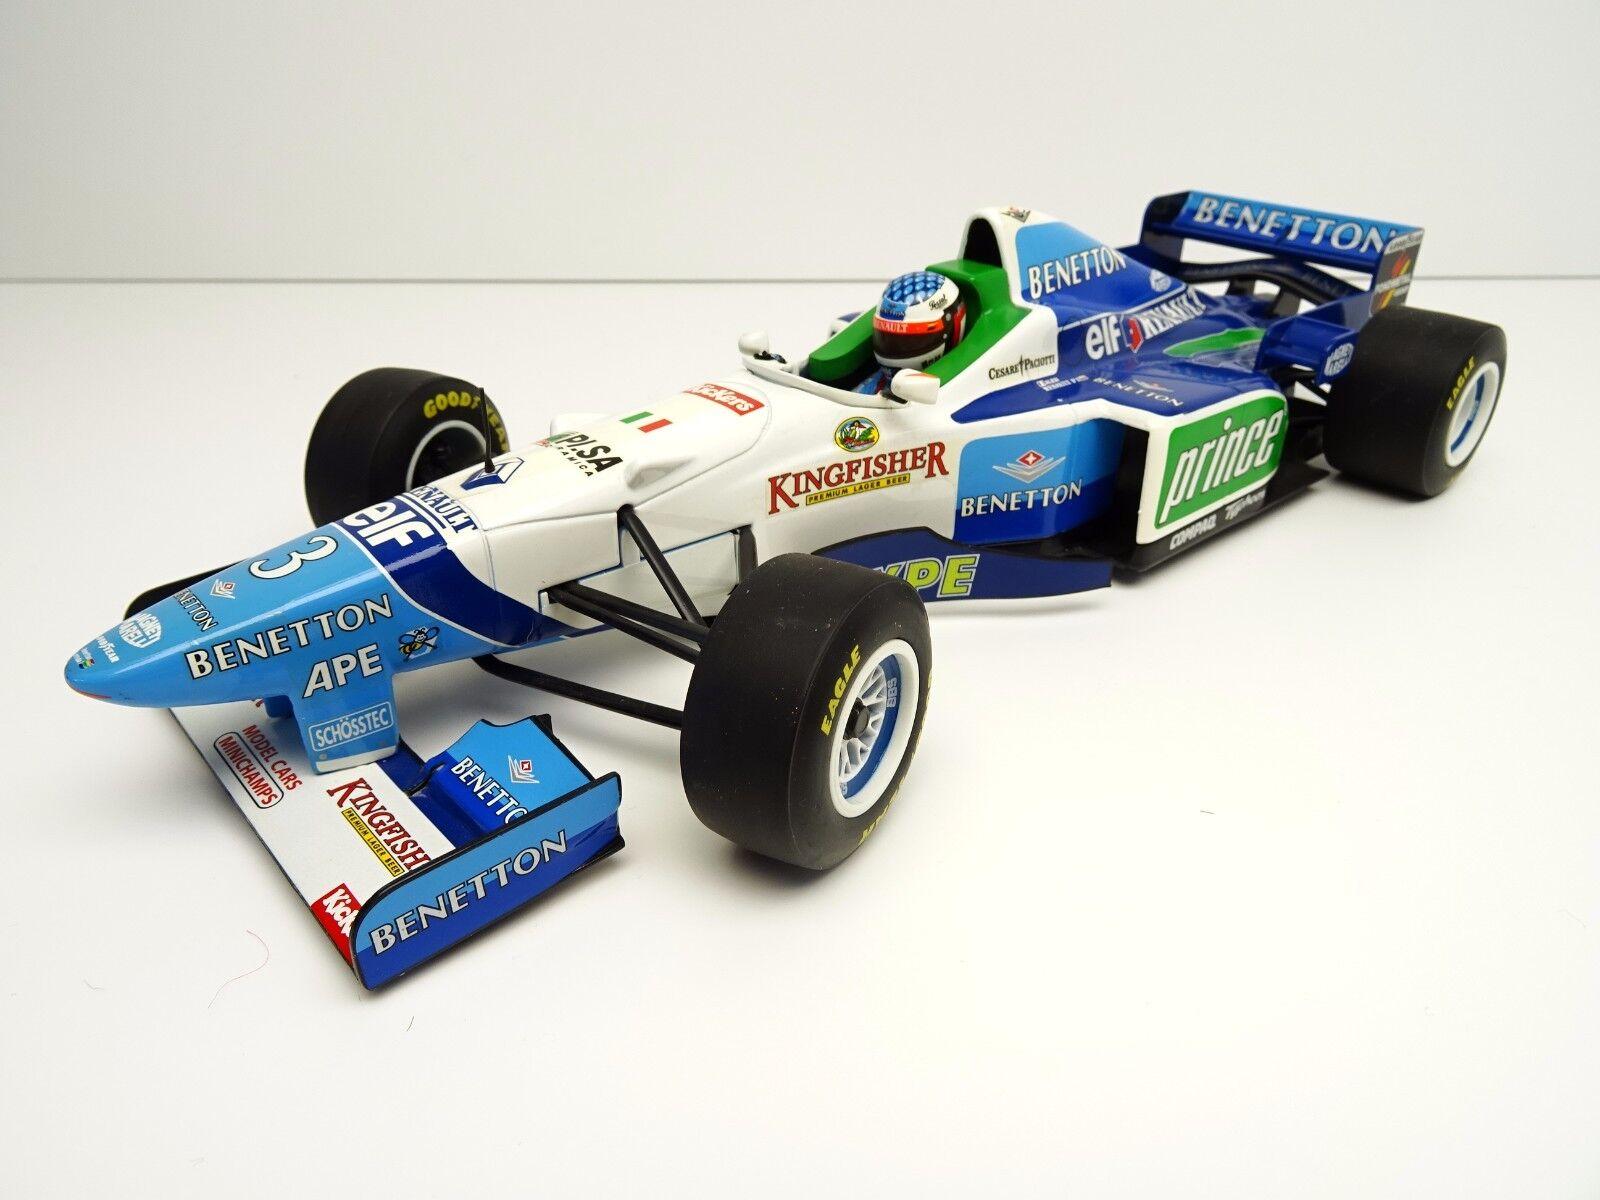 Pauls Model Art 1 18 18 18 F1 Benetton Renault B196 1996 Alesi Nr.3 TOP C3035 17bb42